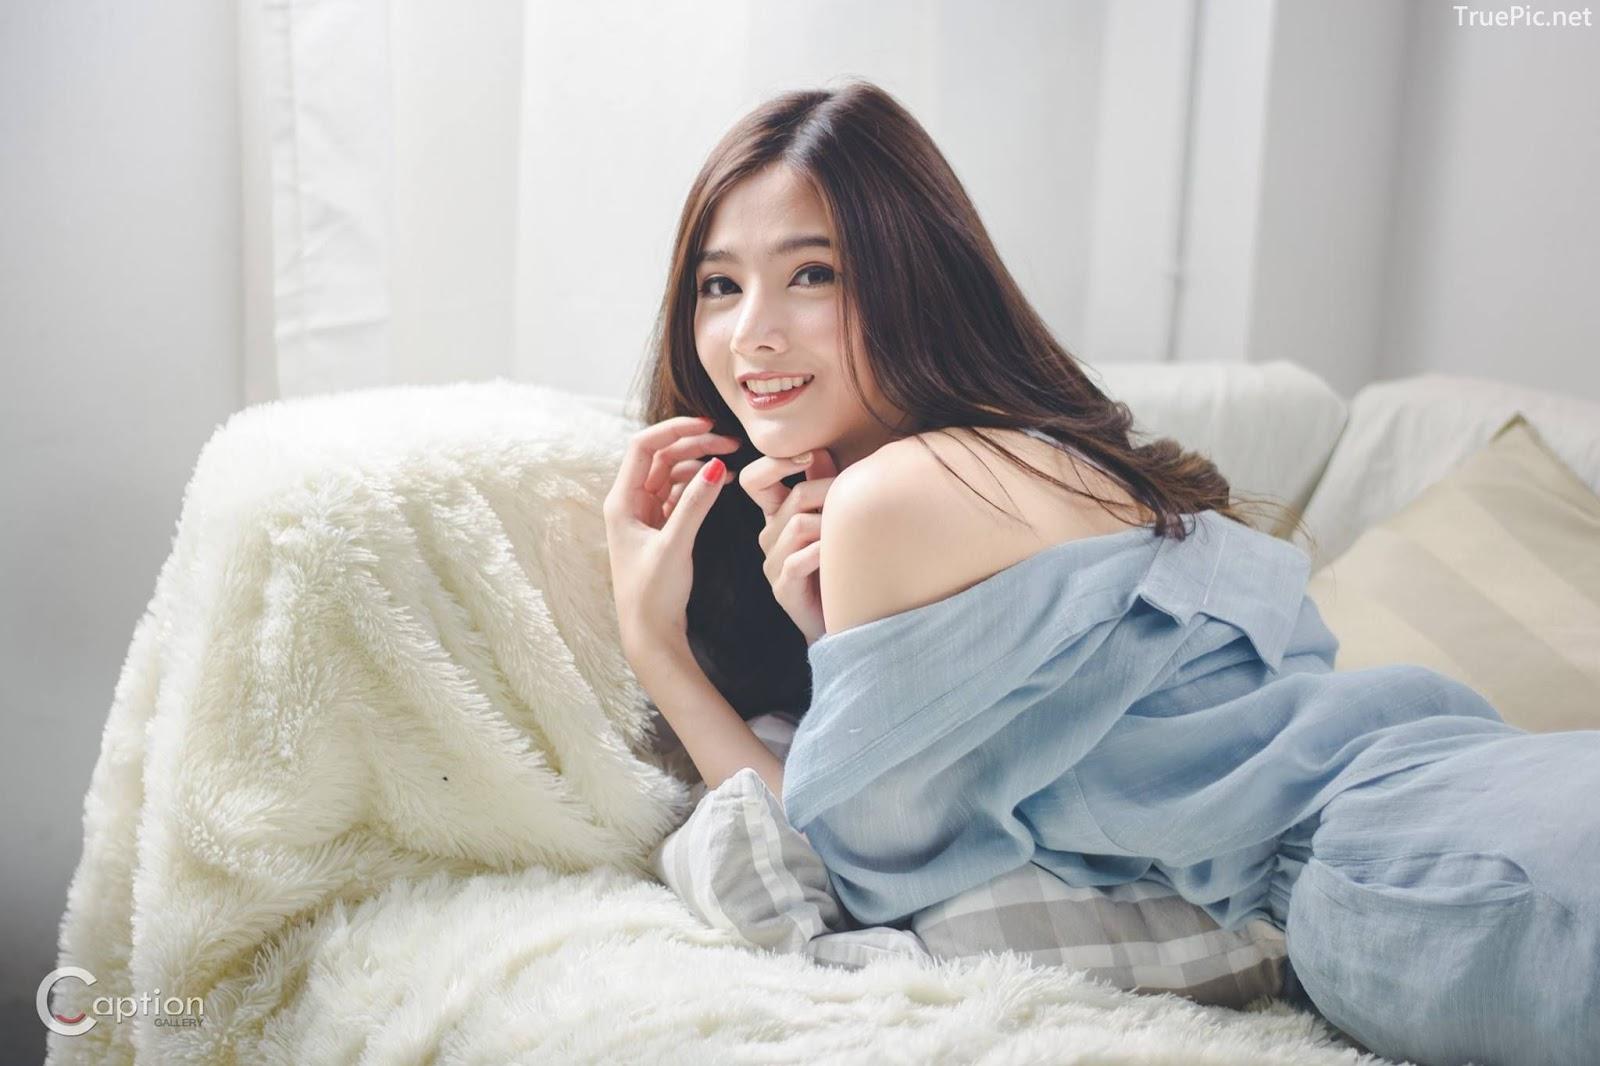 Thailand pretty girl Aintoaon Nantawong - Photo album Beautiful Morning Monday - Picture 7